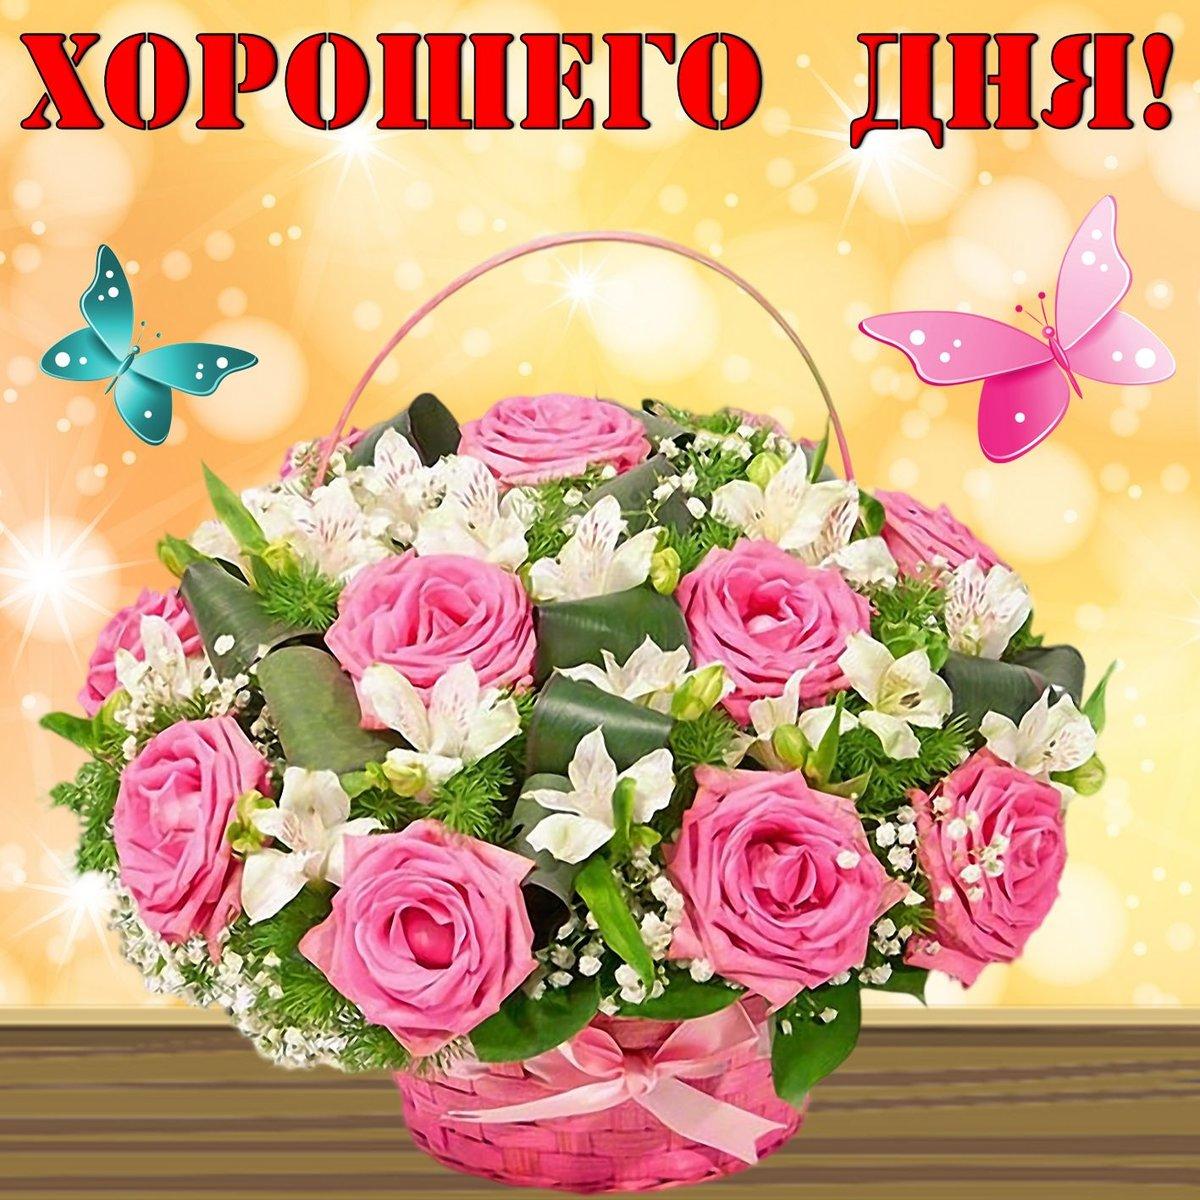 Для бабушки, цветы с пожеланиями картинки